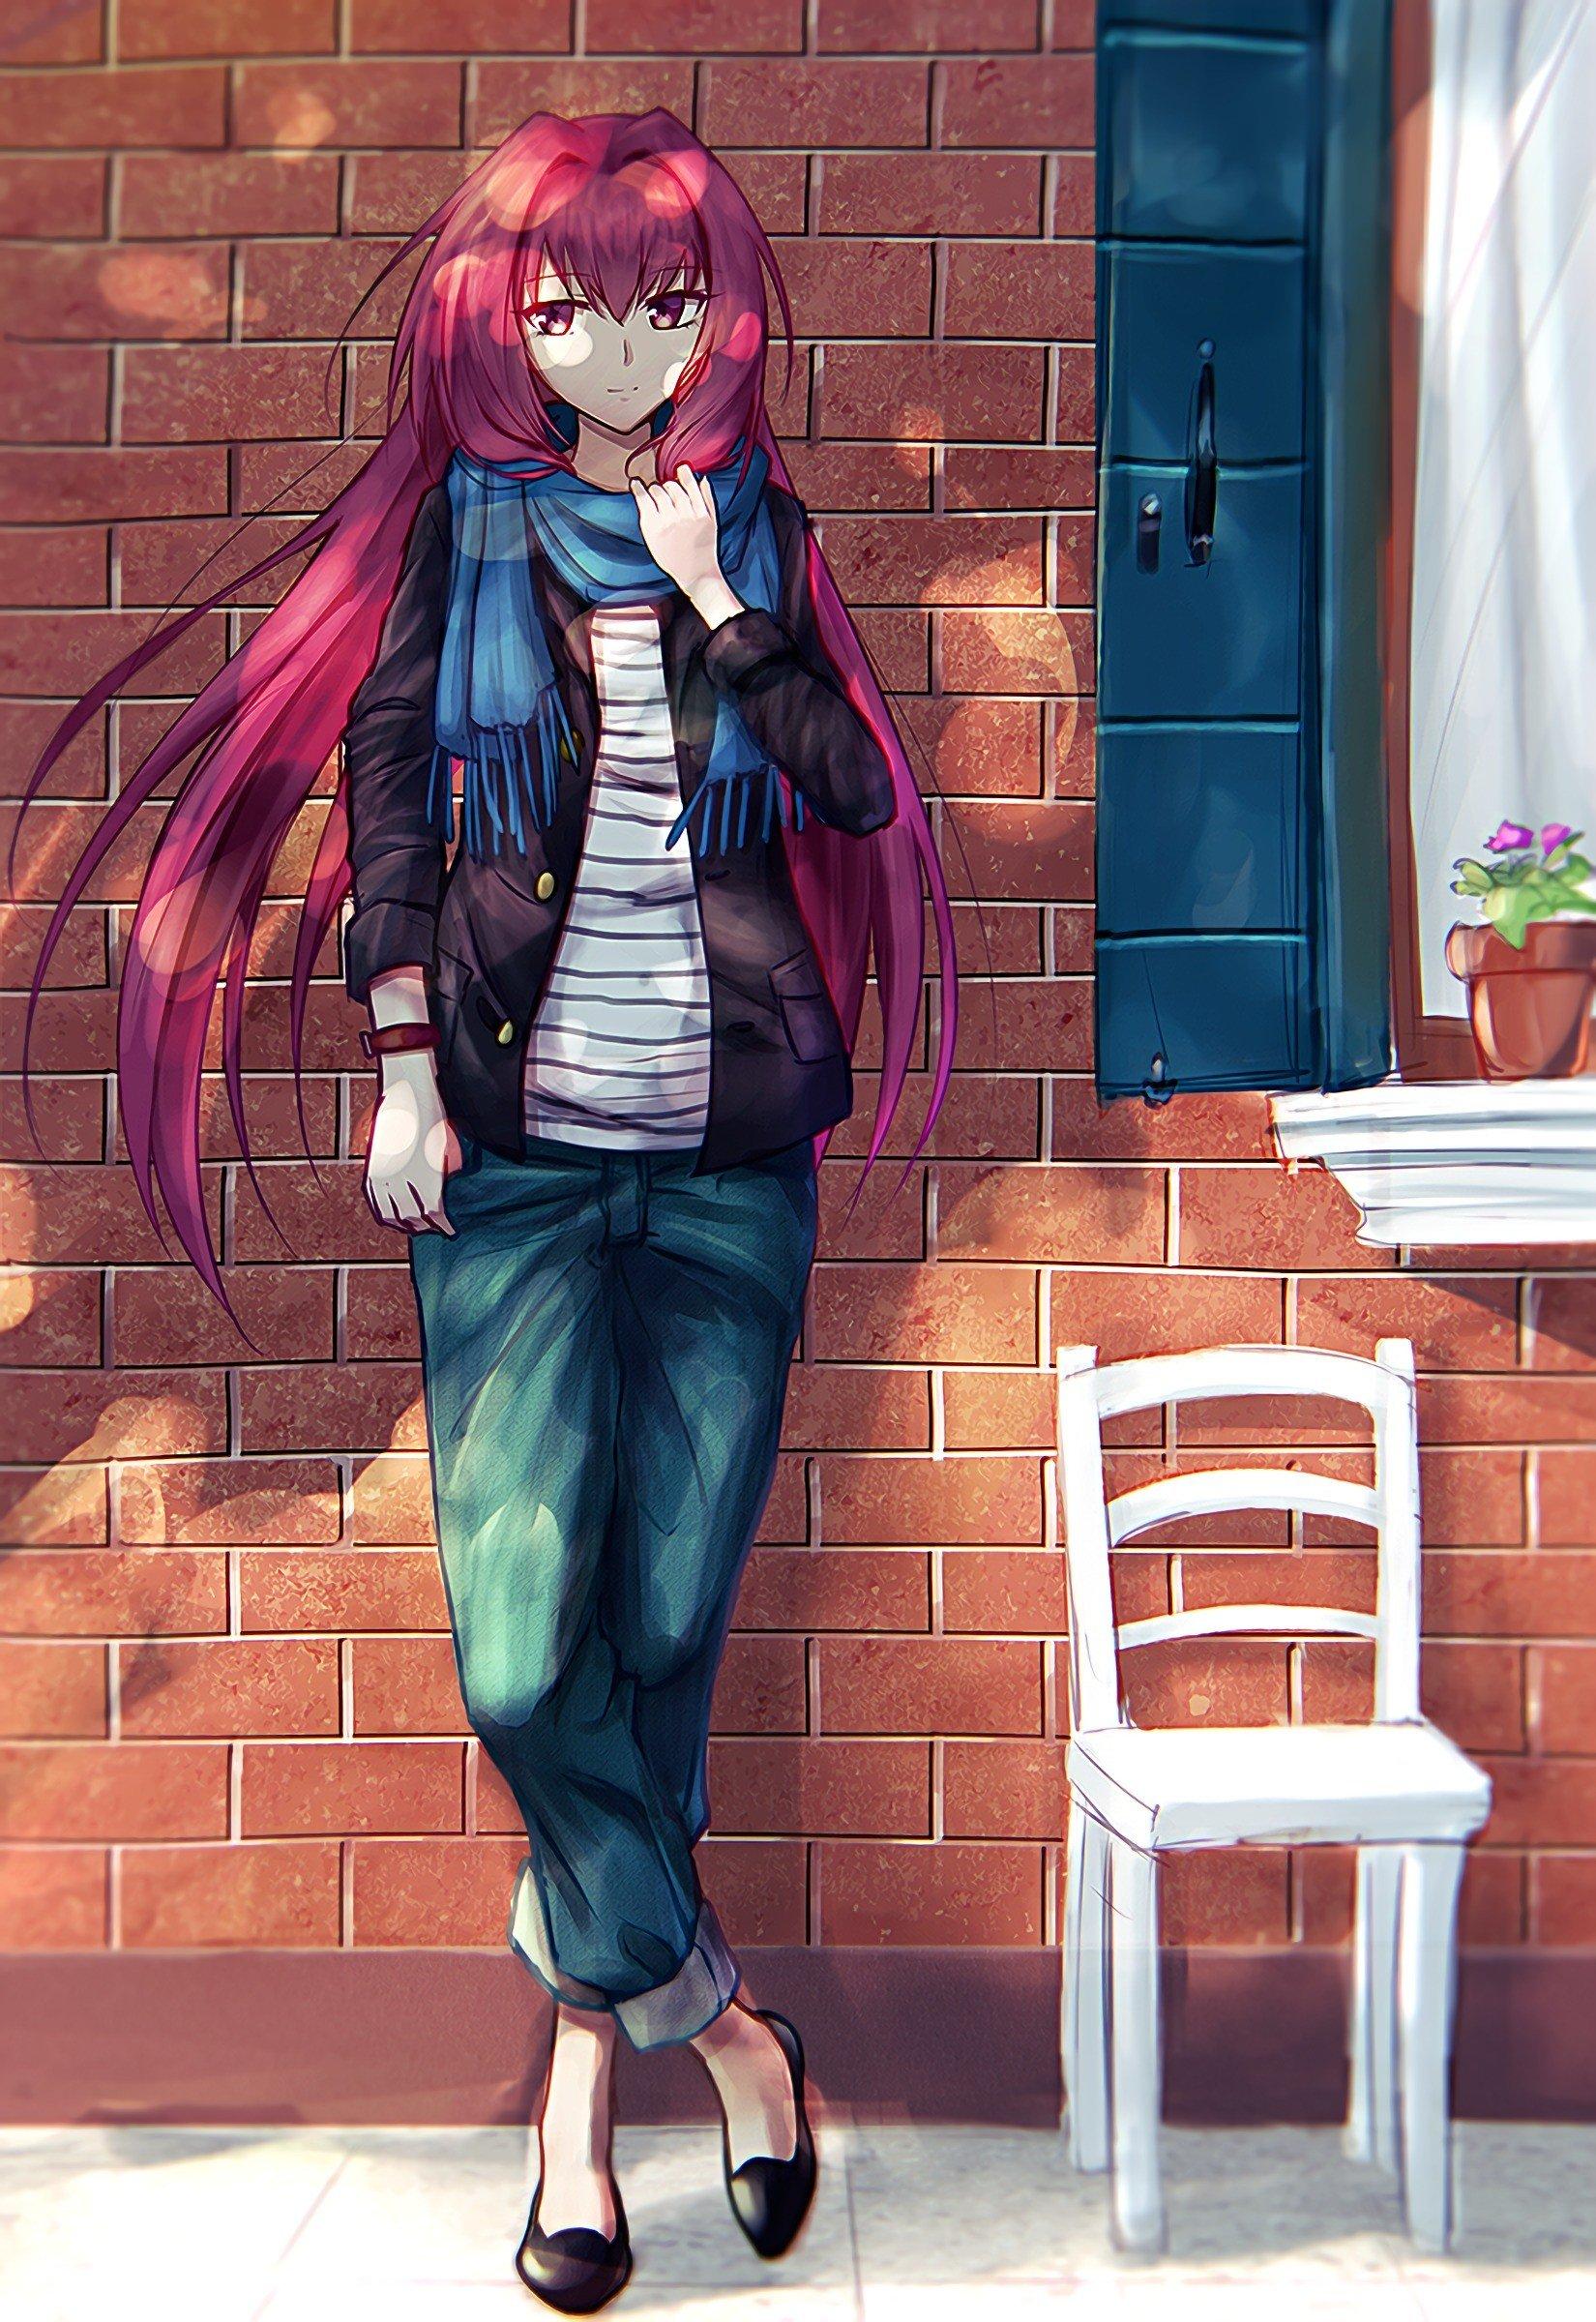 long hair, Redhead, Red eyes, Anime, Anime girls, Fate ...